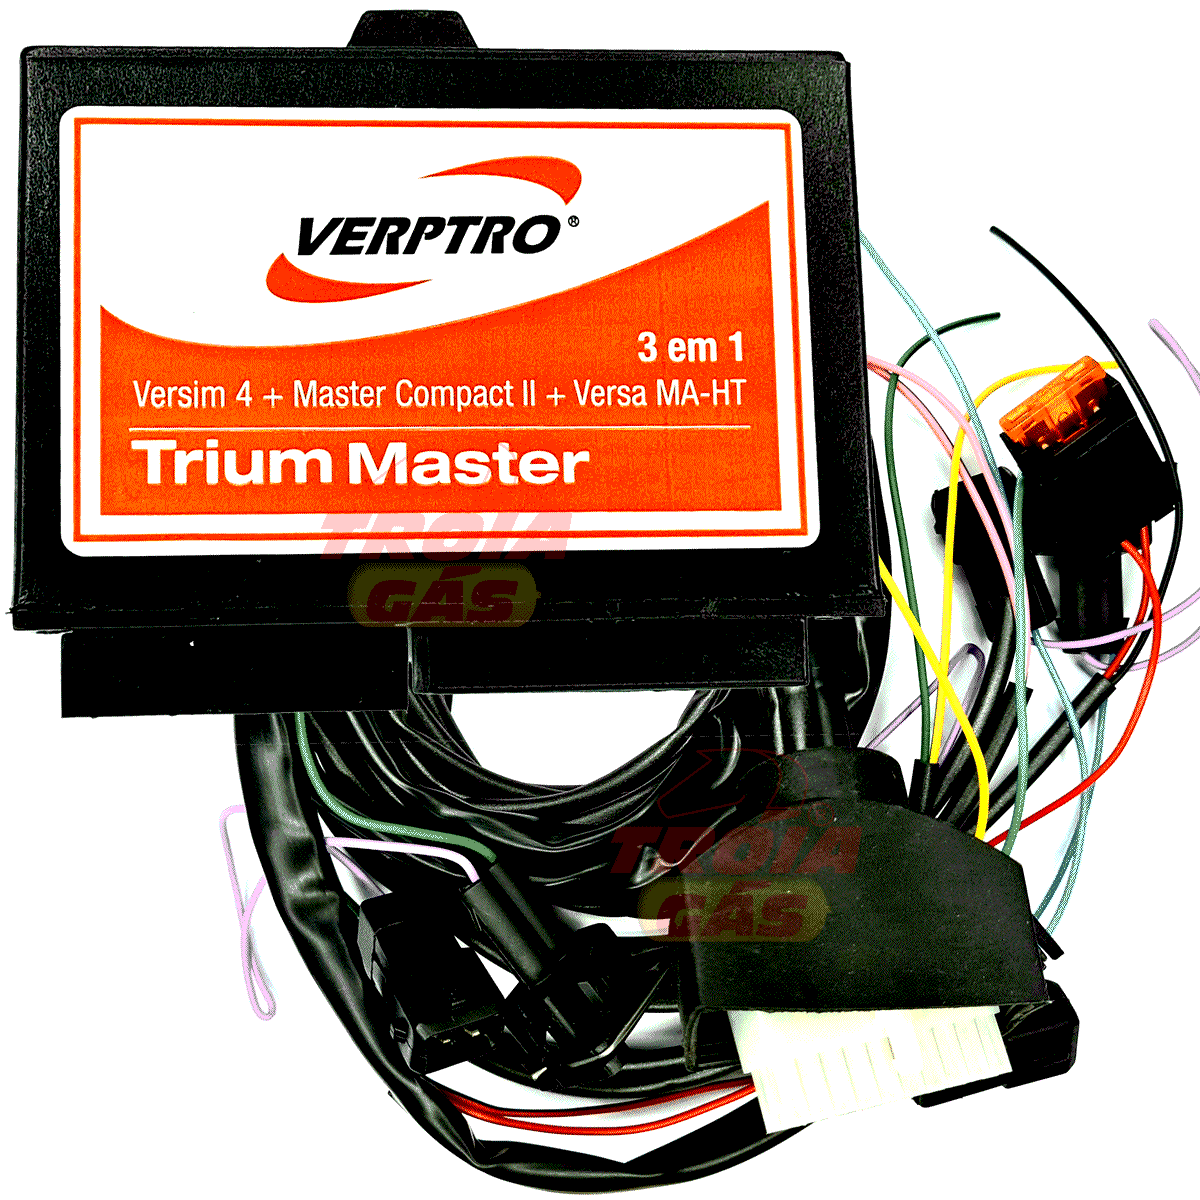 Emulador Bicos Simulador Sonda Variador TRIUM 3x1 VERPTRO